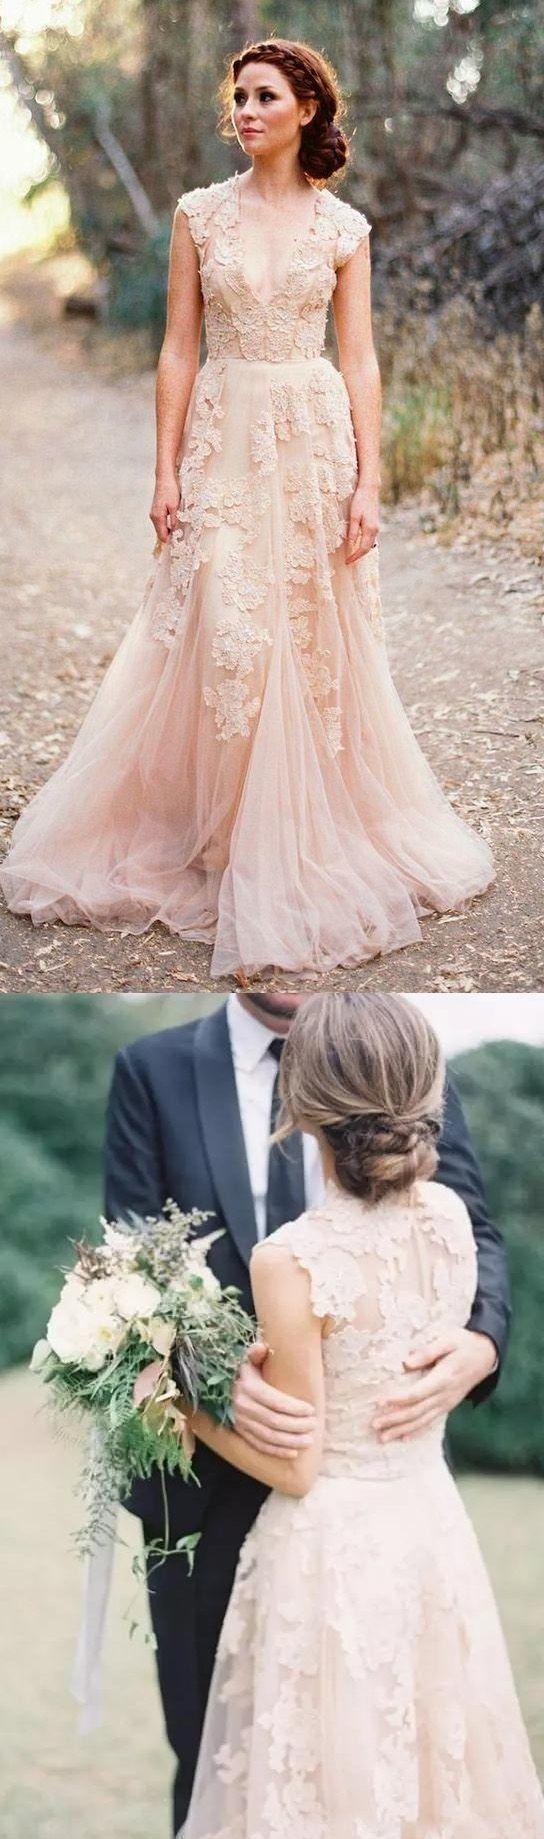 Champagne and ivory wedding dress  Sleeveless Dresses Long Champagne Wedding Dresses With Applique